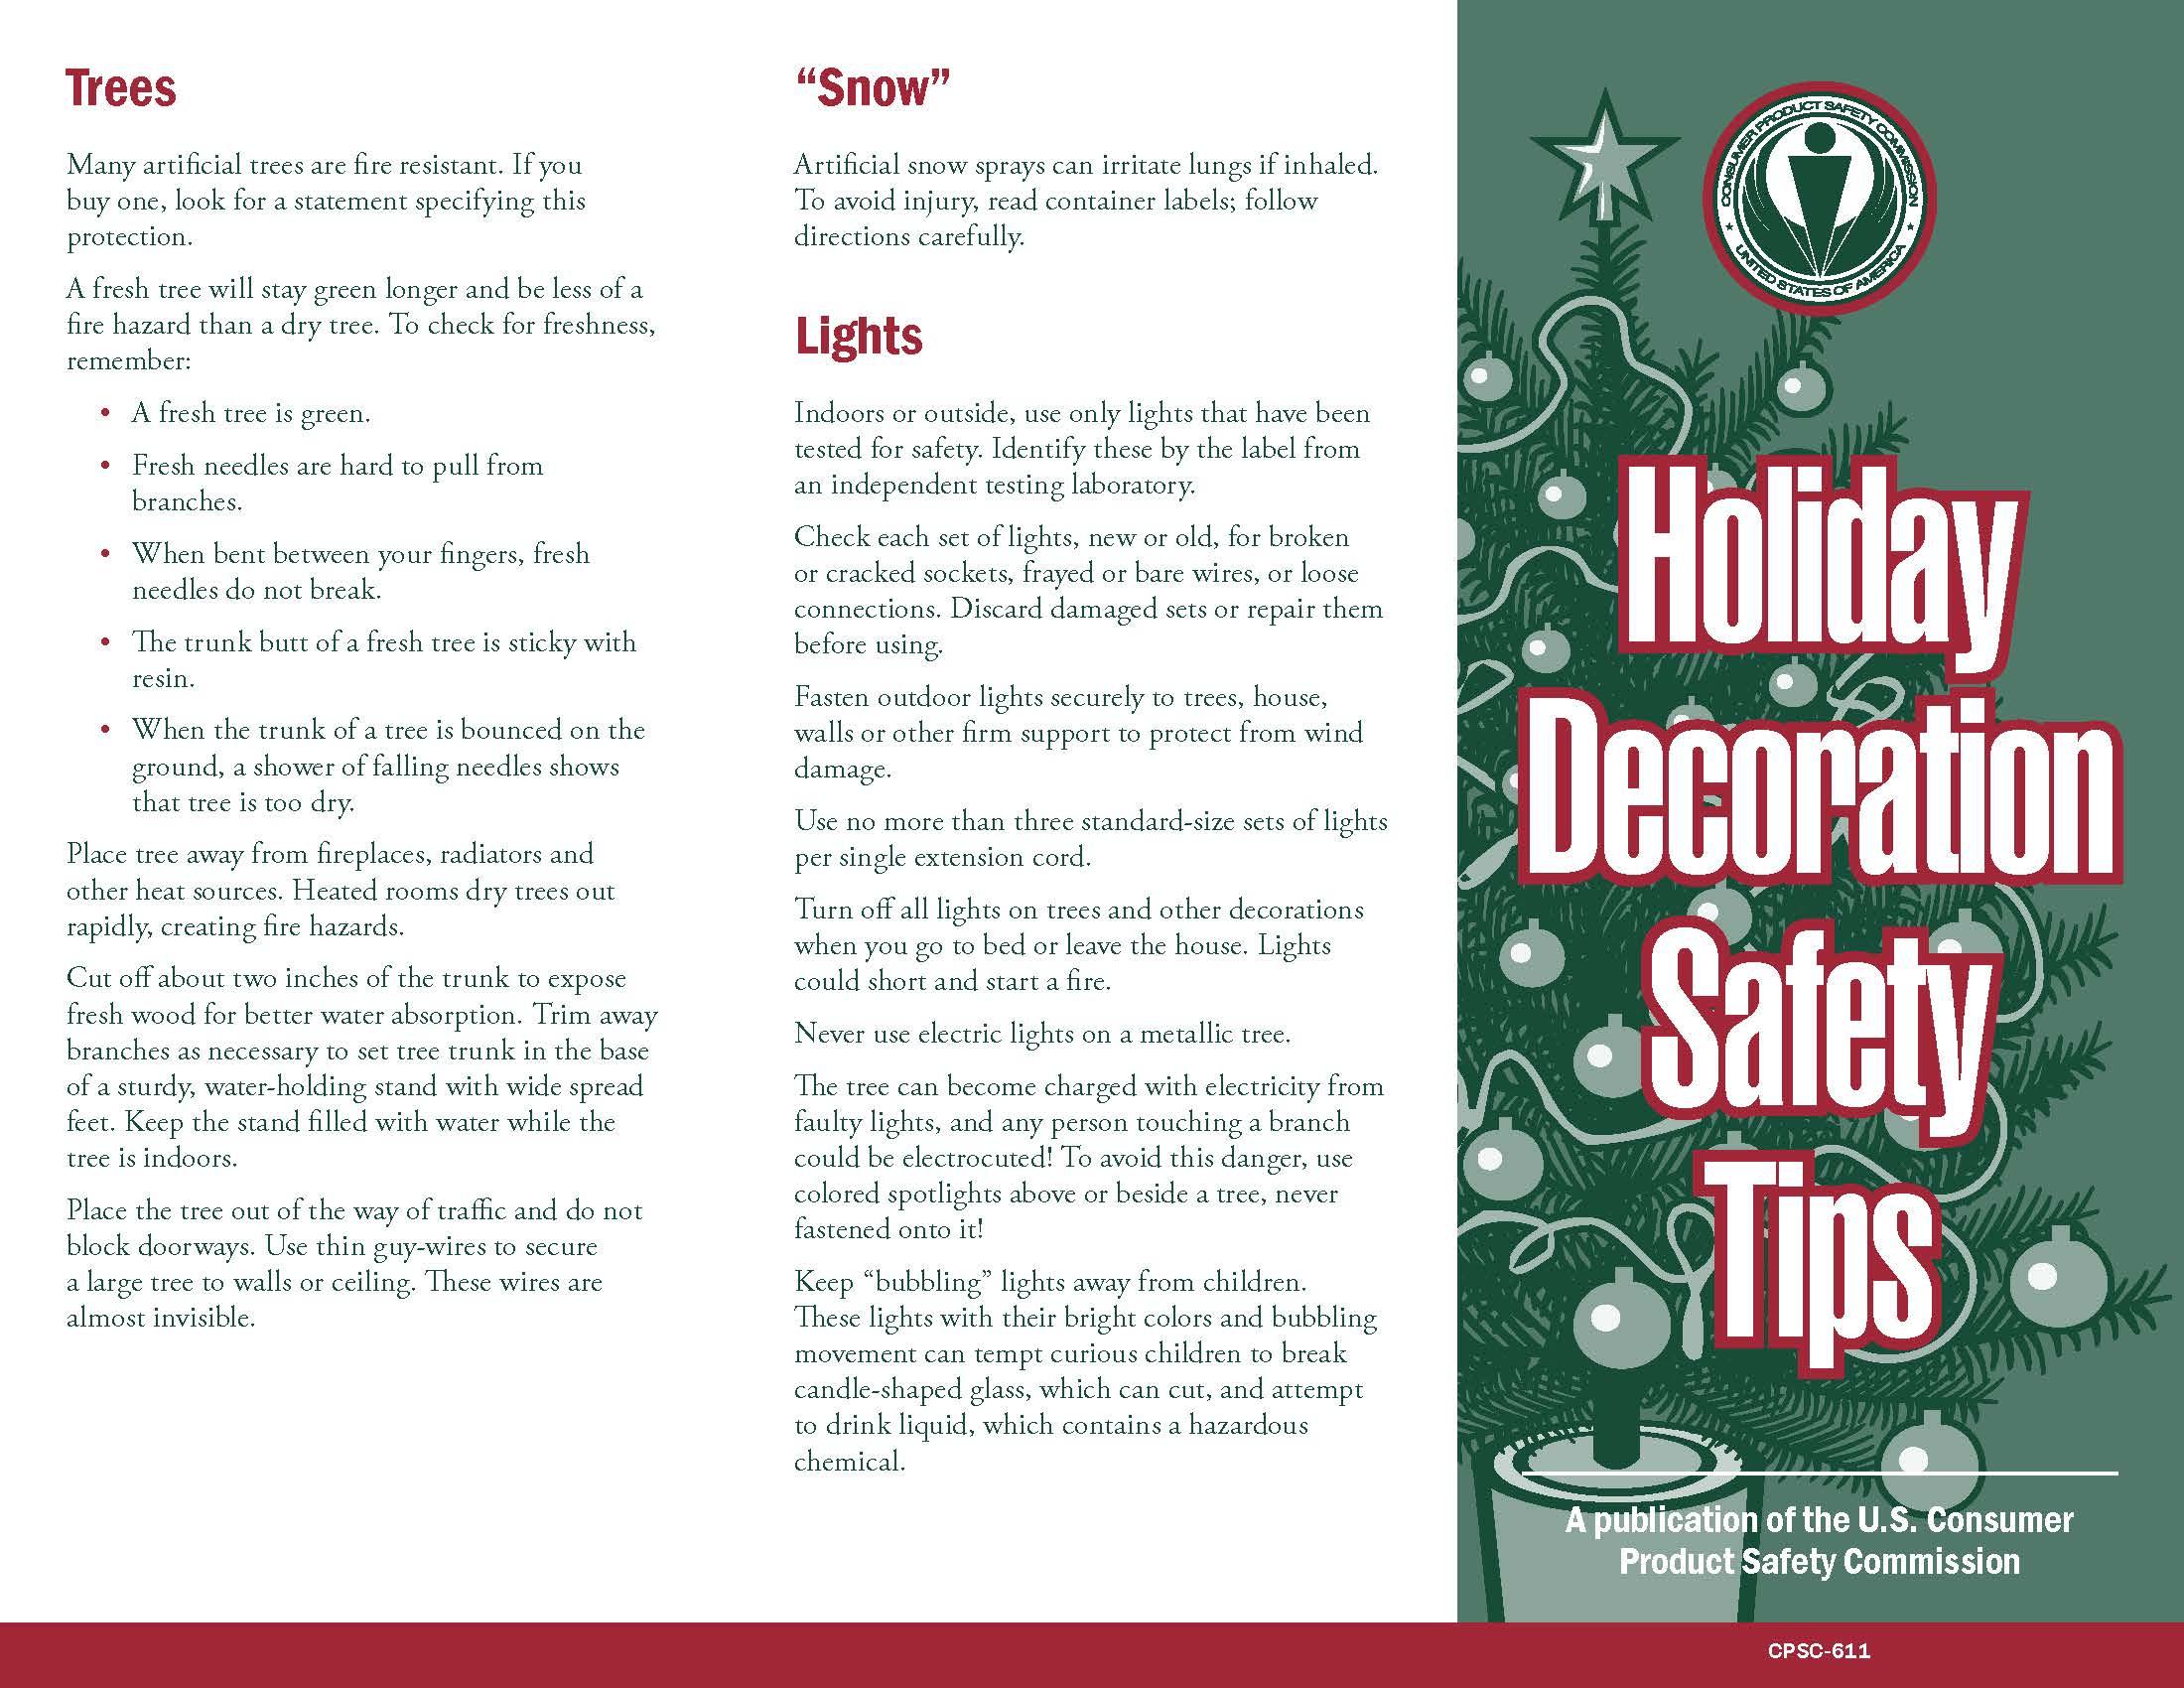 Holiday Decorating p.1